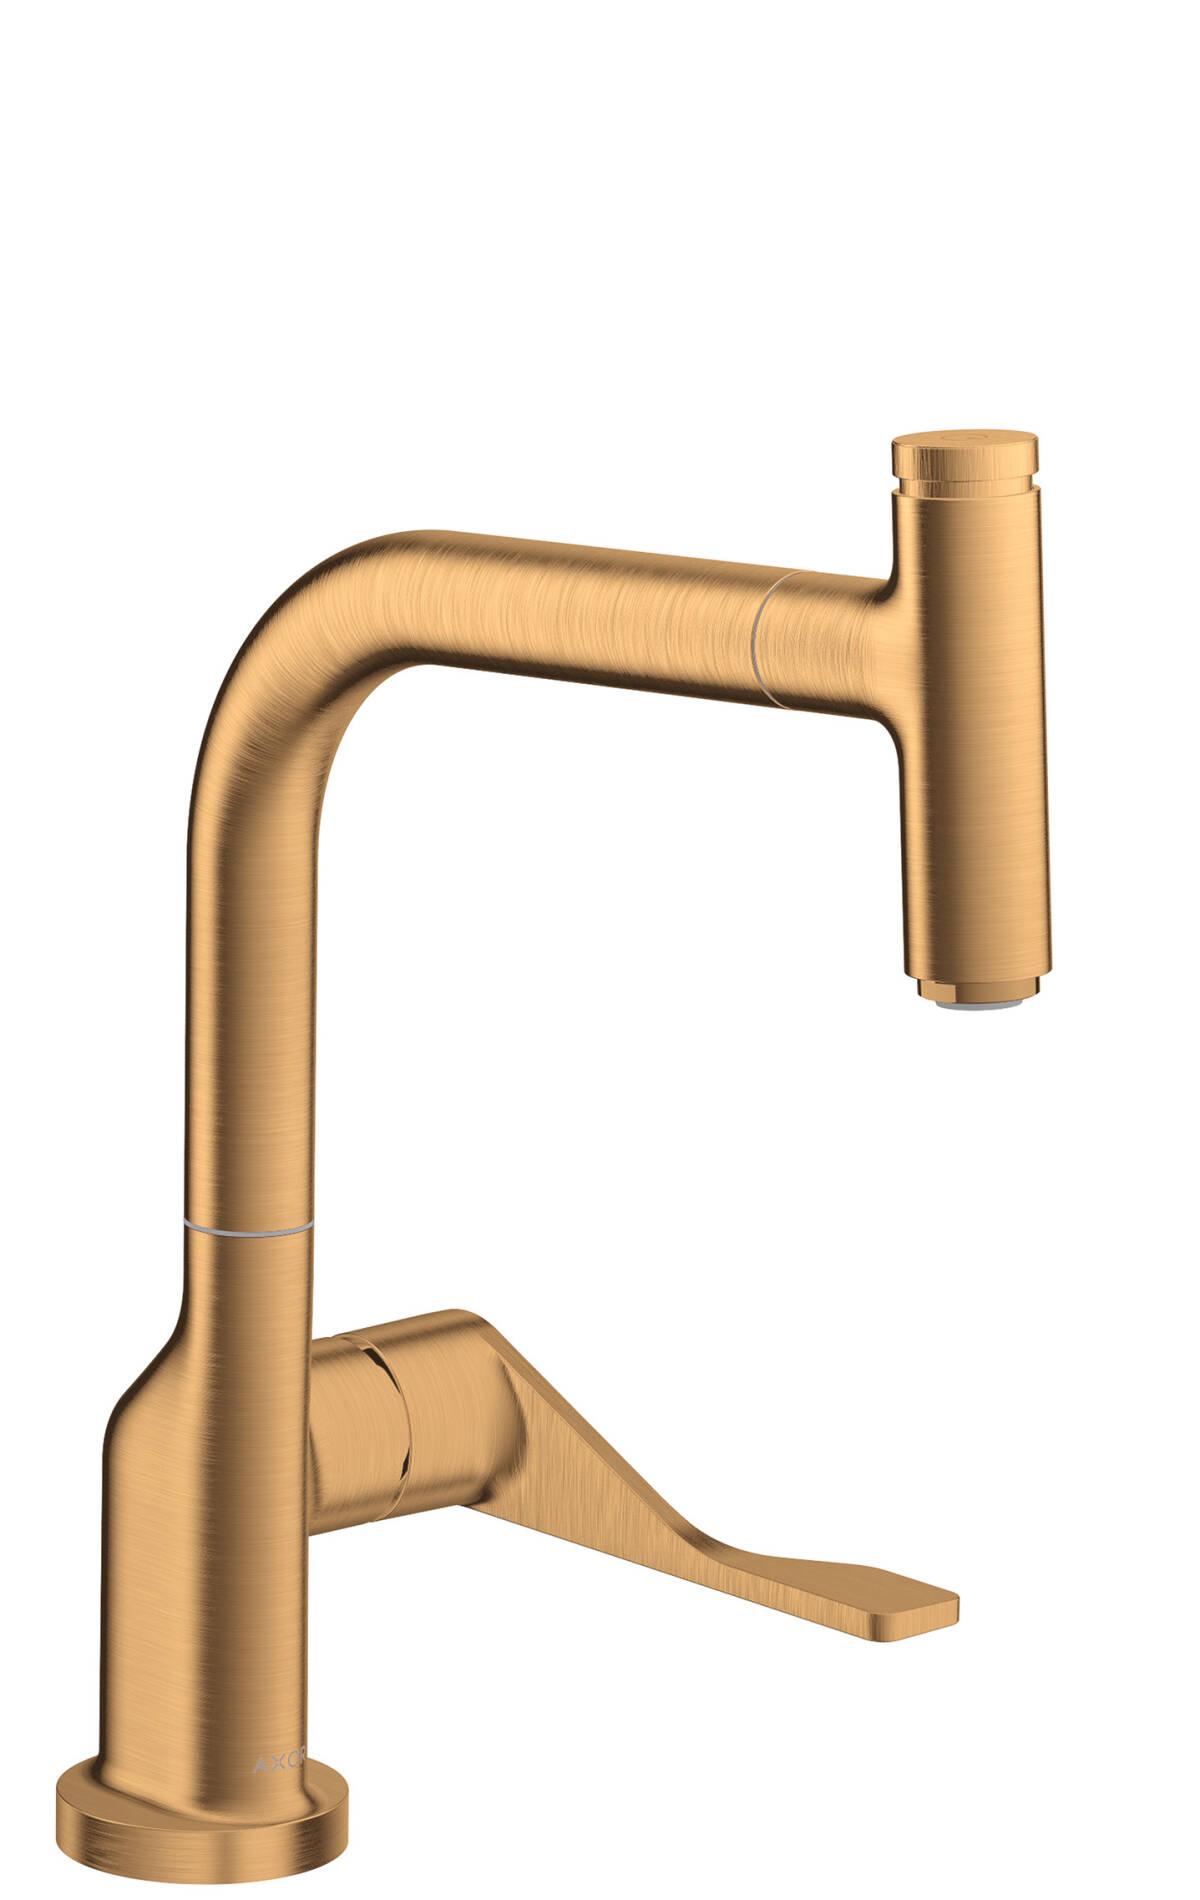 Mezclador monomando de cocina Select 230 con caño extraíble, color oro cepillado, 39861250